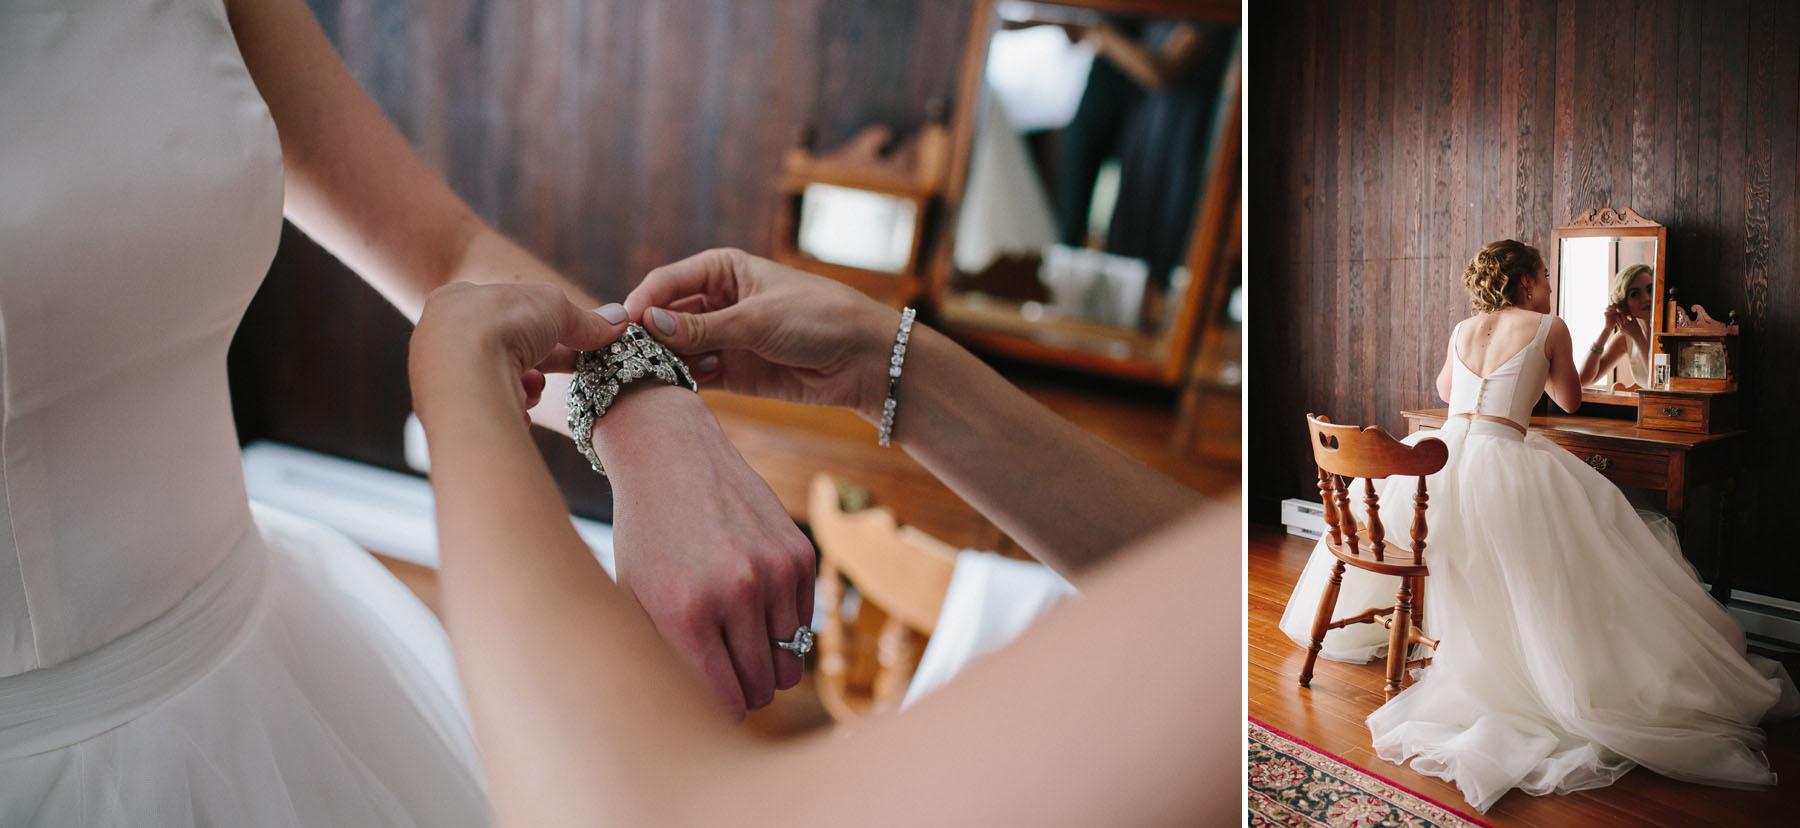 thetis-island-wedding-photographer-rp-rn-051.jpg